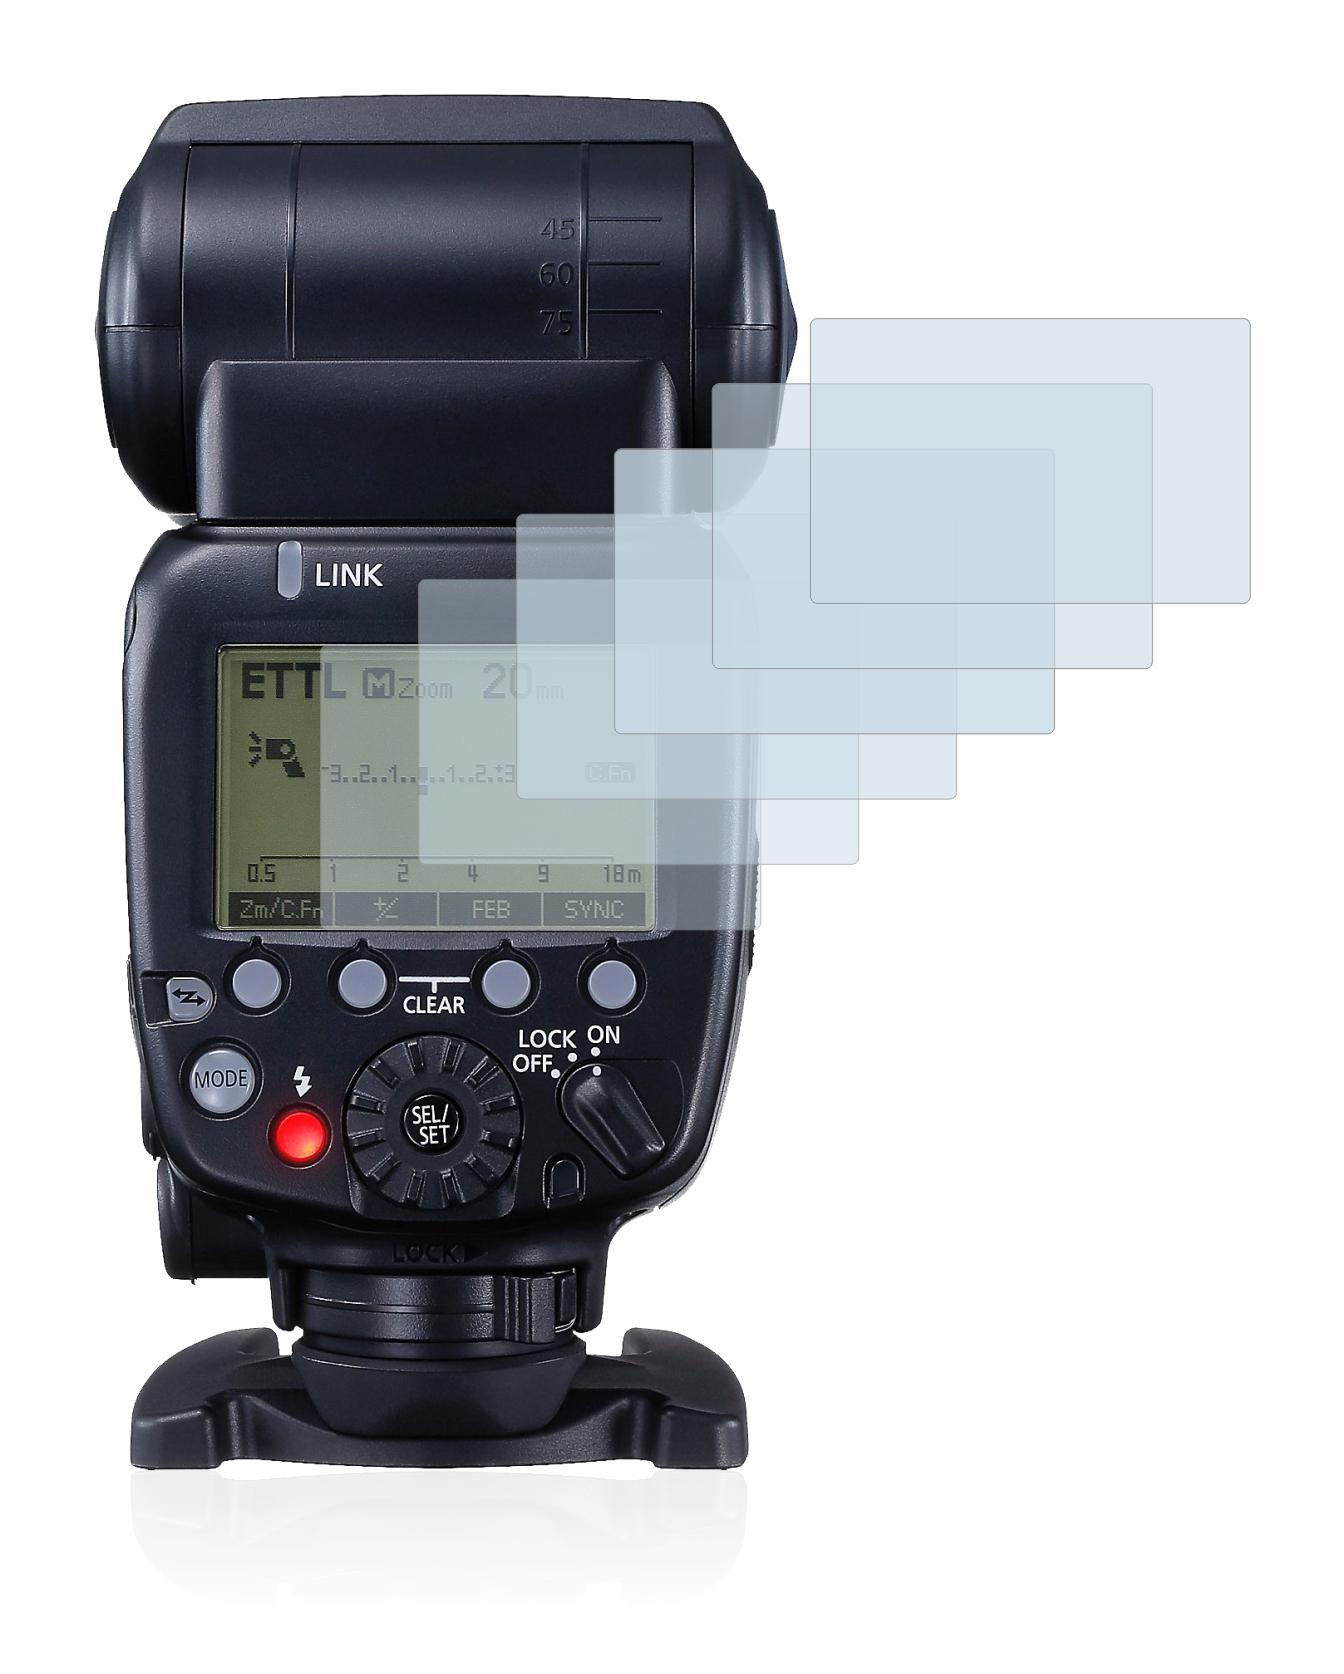 6x Pellicola protettiva display Canon Speedlite 600ex-rt Flash Pellicola Protettiva Display Pellicola